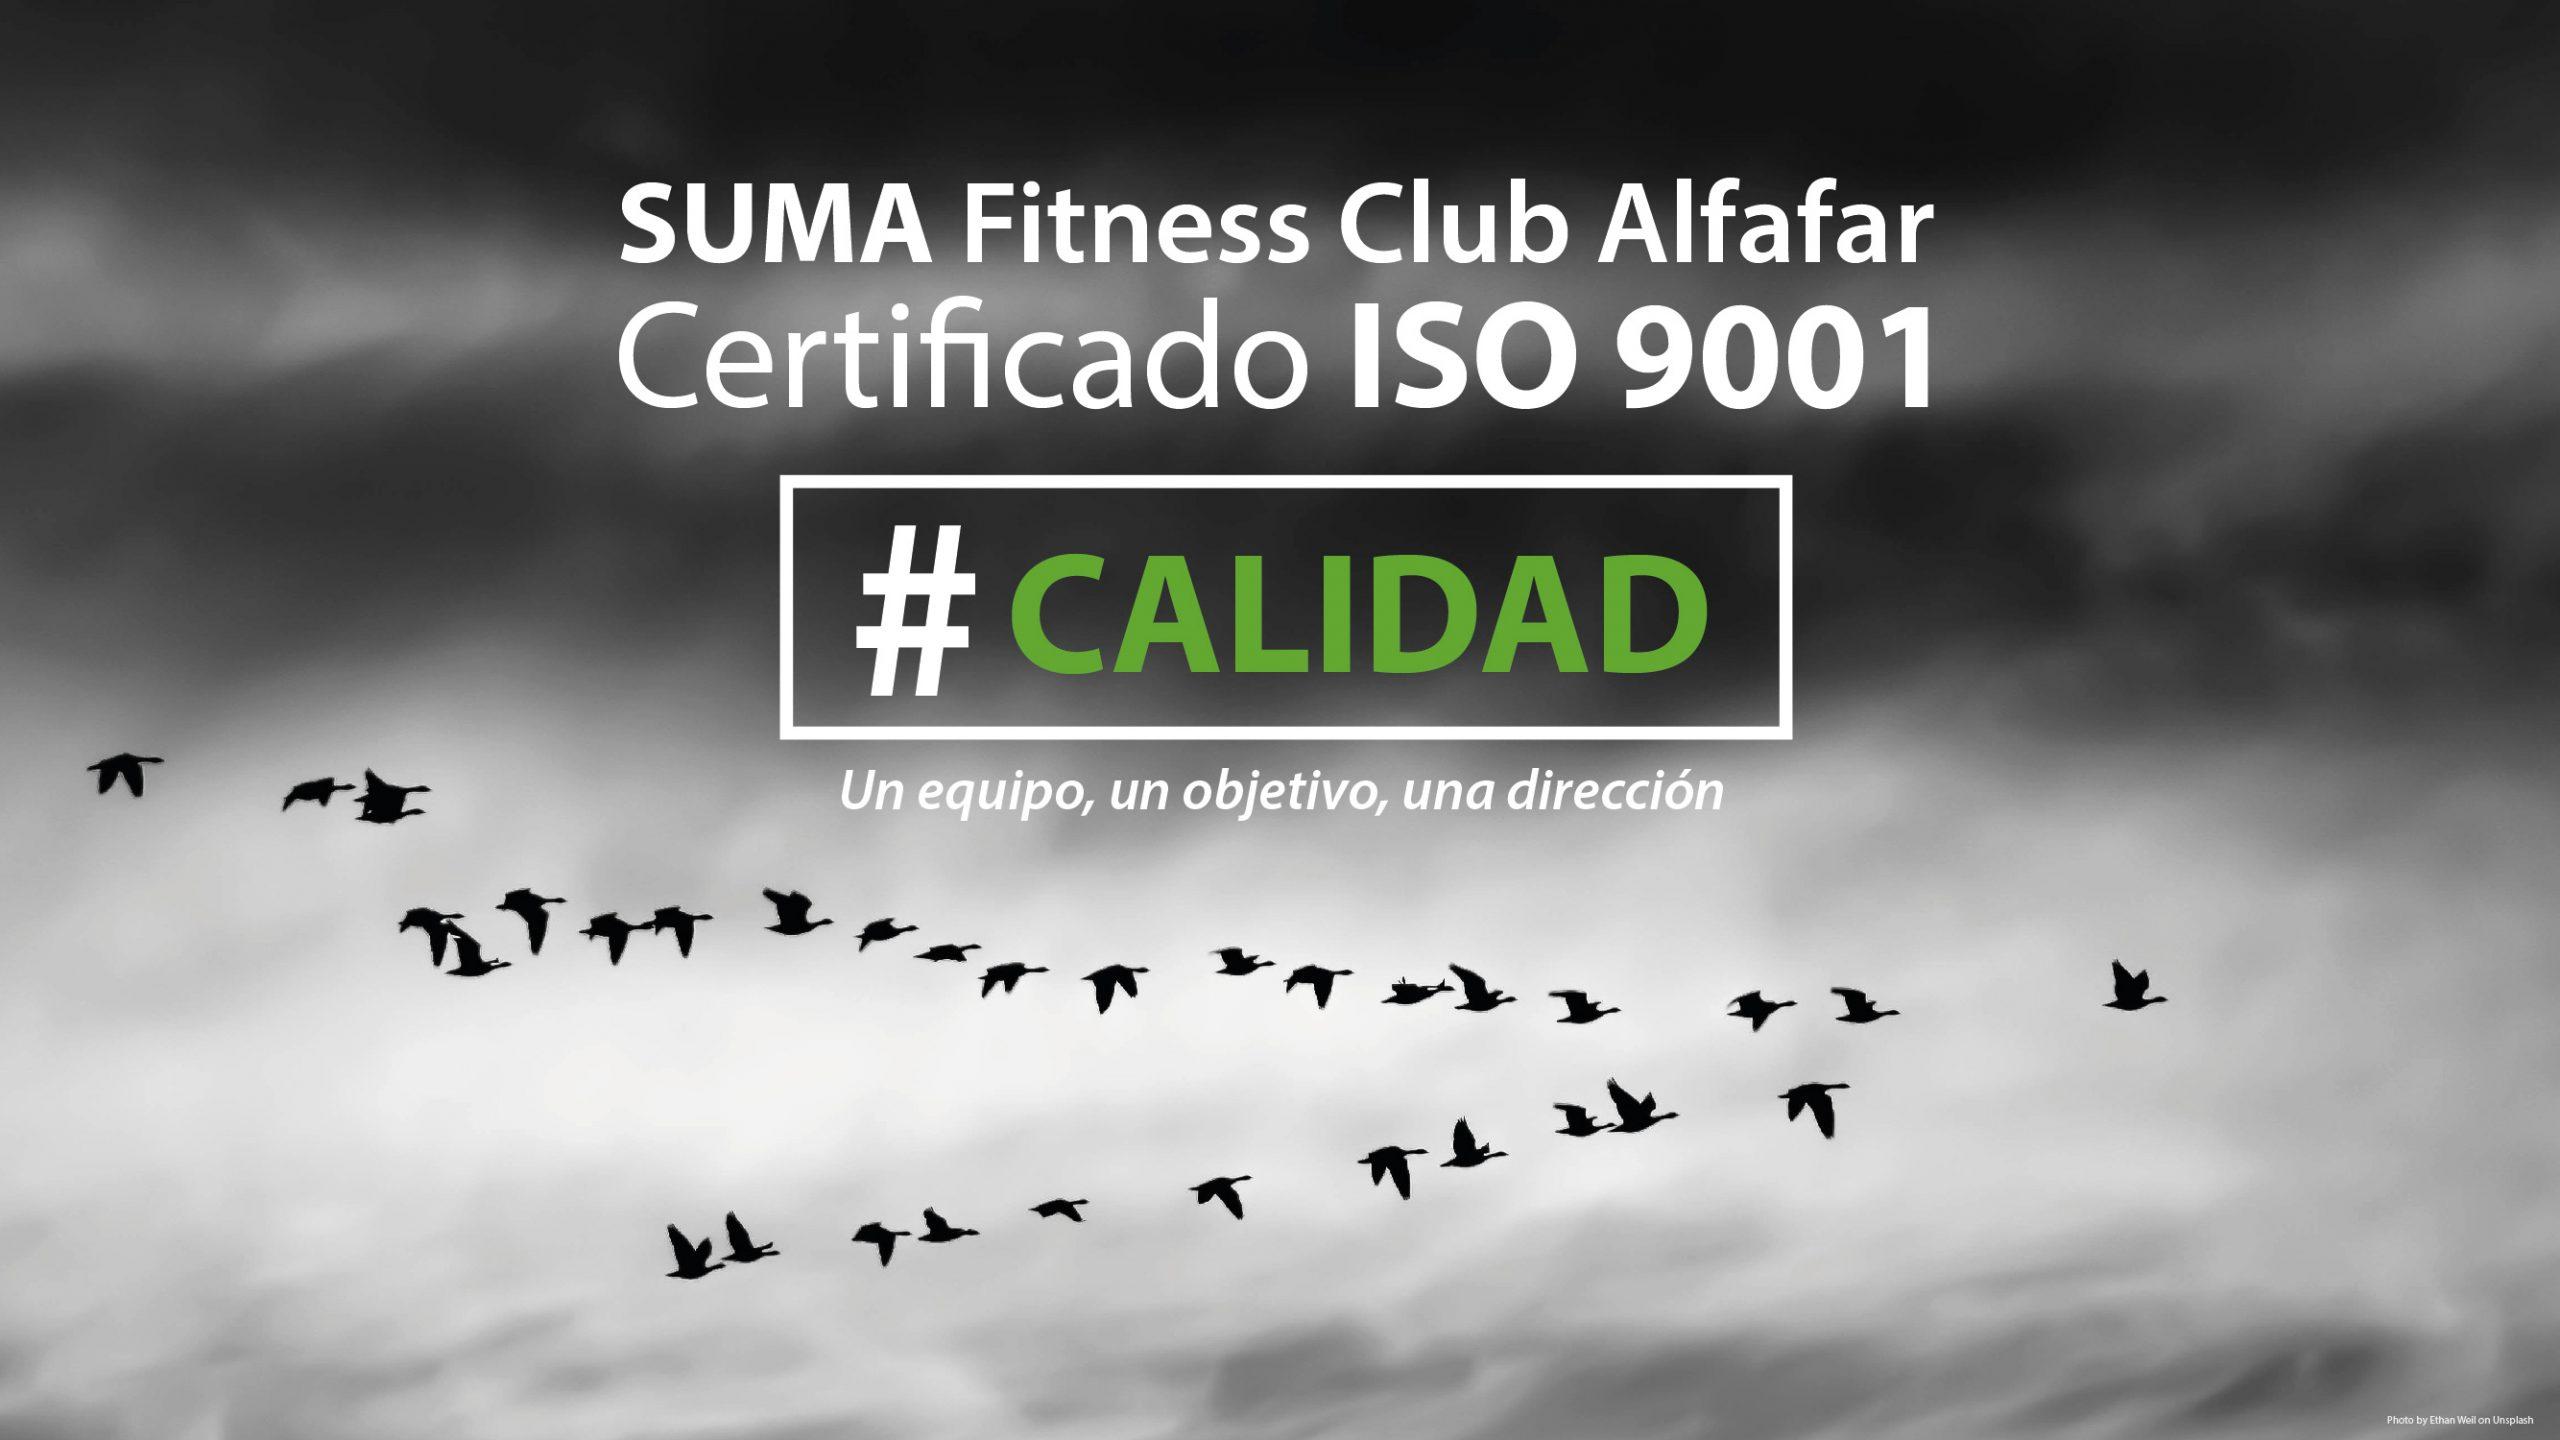 suma-fitness-club-alfafar-calidad-iso-9001